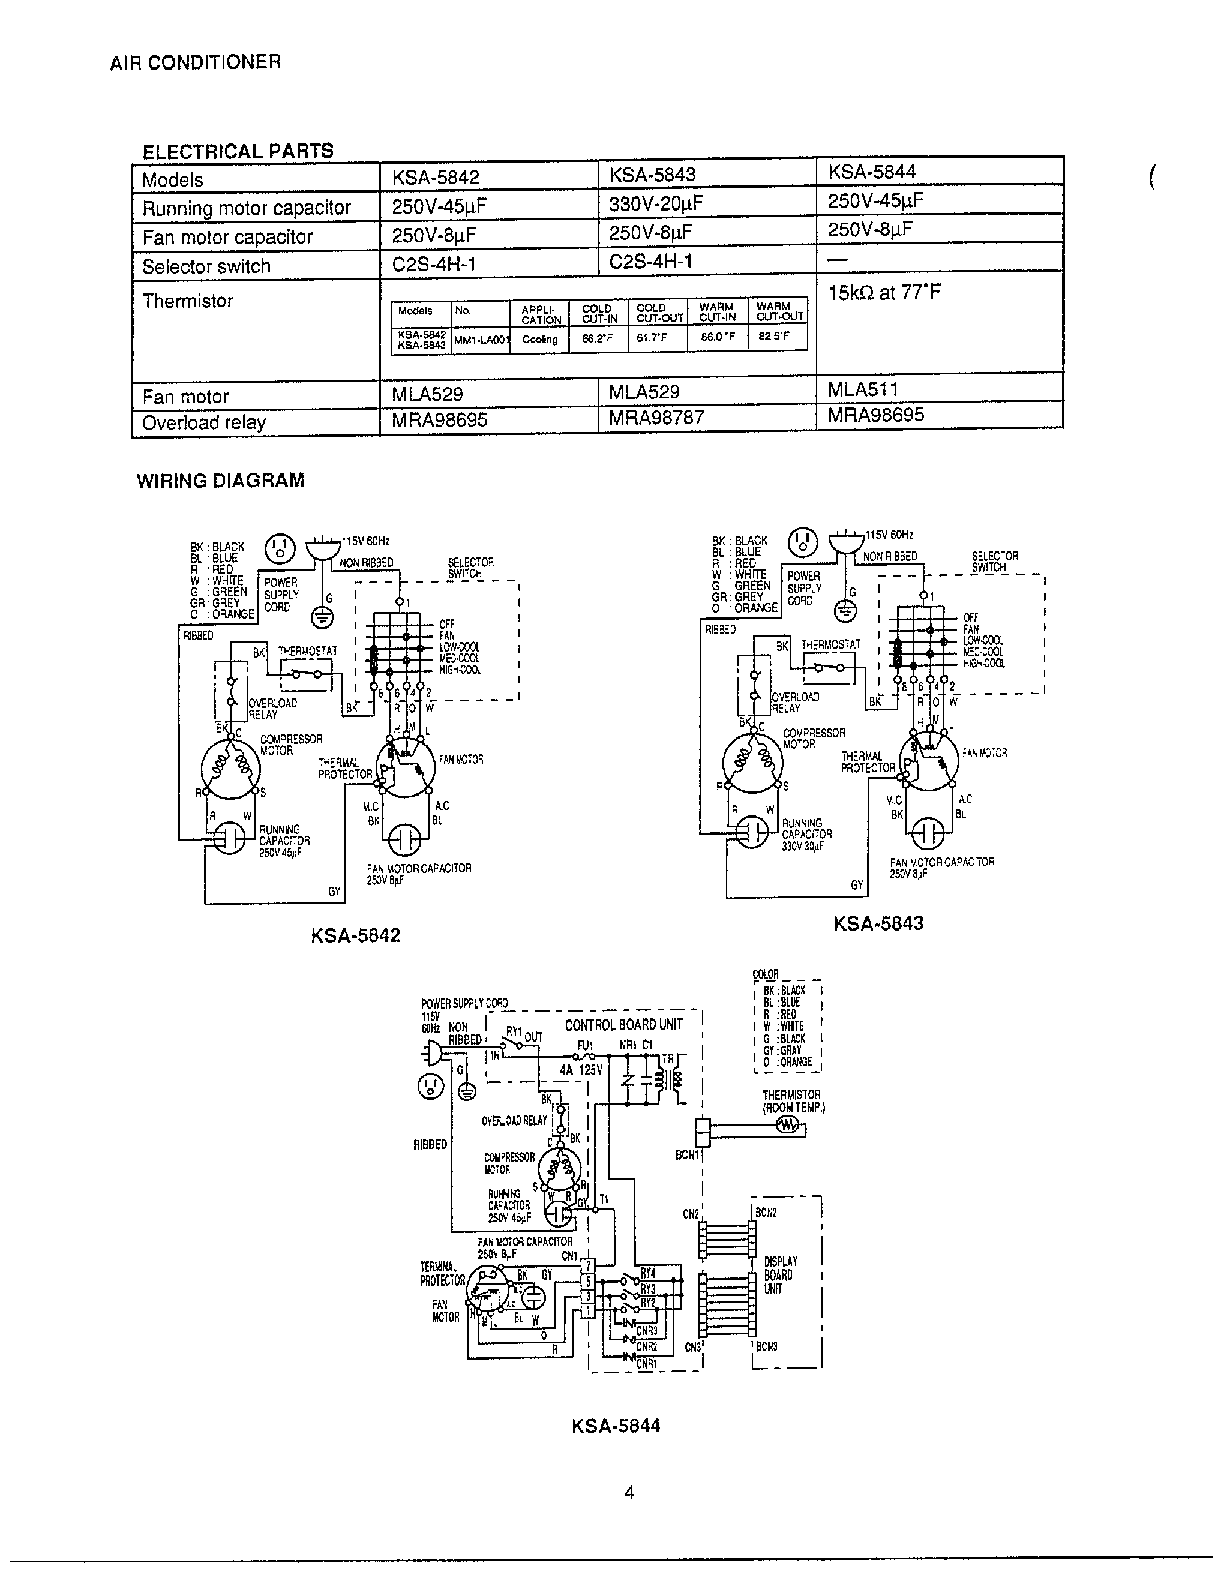 Eb12b Furnace Transformer Wiring Schematic Radio Diagram Circuit Symbols U2022 Rh Veturecapitaltrust Co Coleman Parts Eb10b Guide